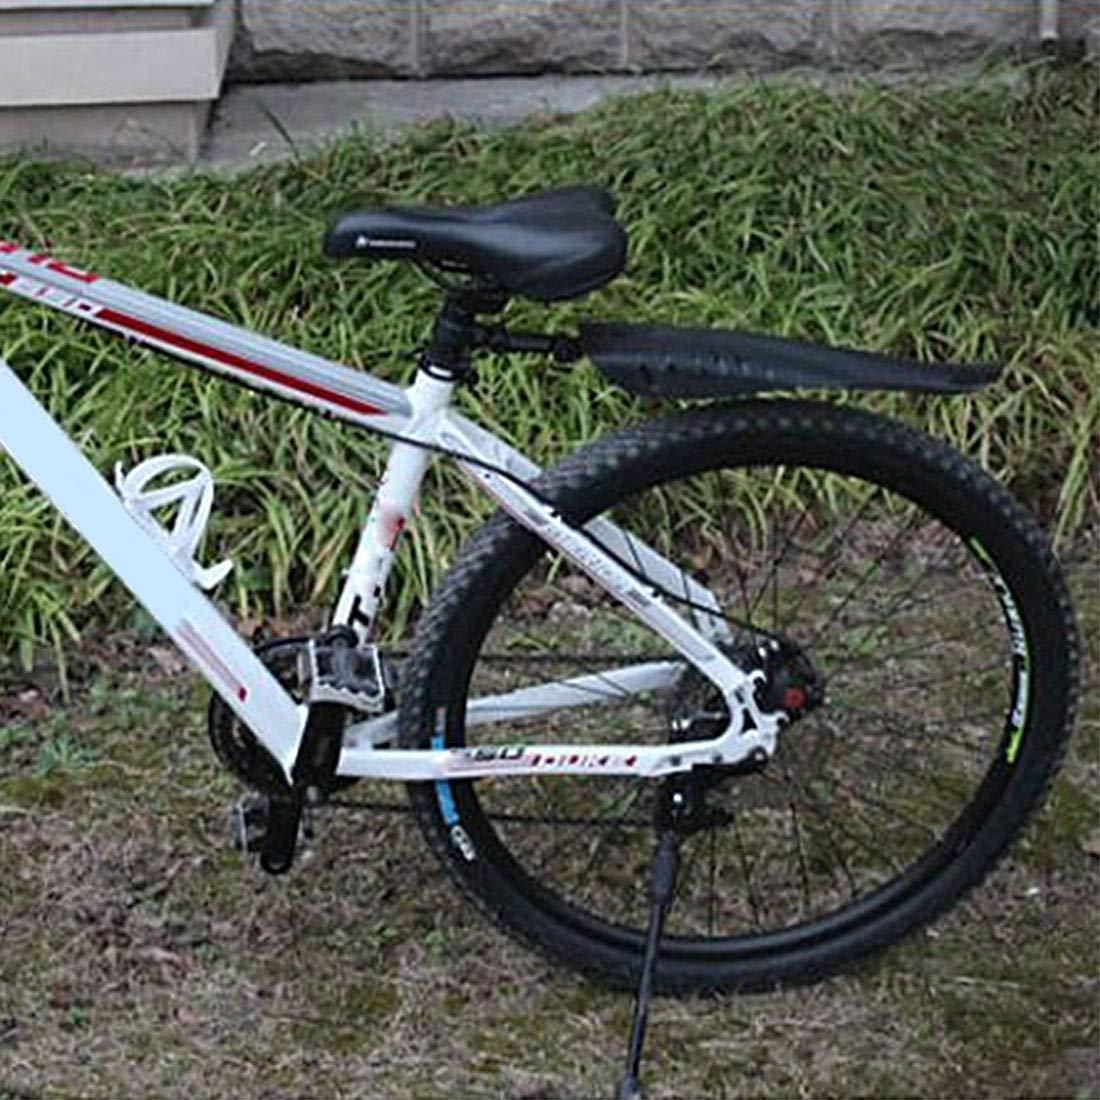 joyliveCY Bicicleta Guardabarros Universal Pl/ástico Alas de Bicicleta de monta/ña Conjunto de Guardabarros Delantero//Trasero Guardabarros extra/íbles Flaps Accesorios para Bicicletas 1 Juego